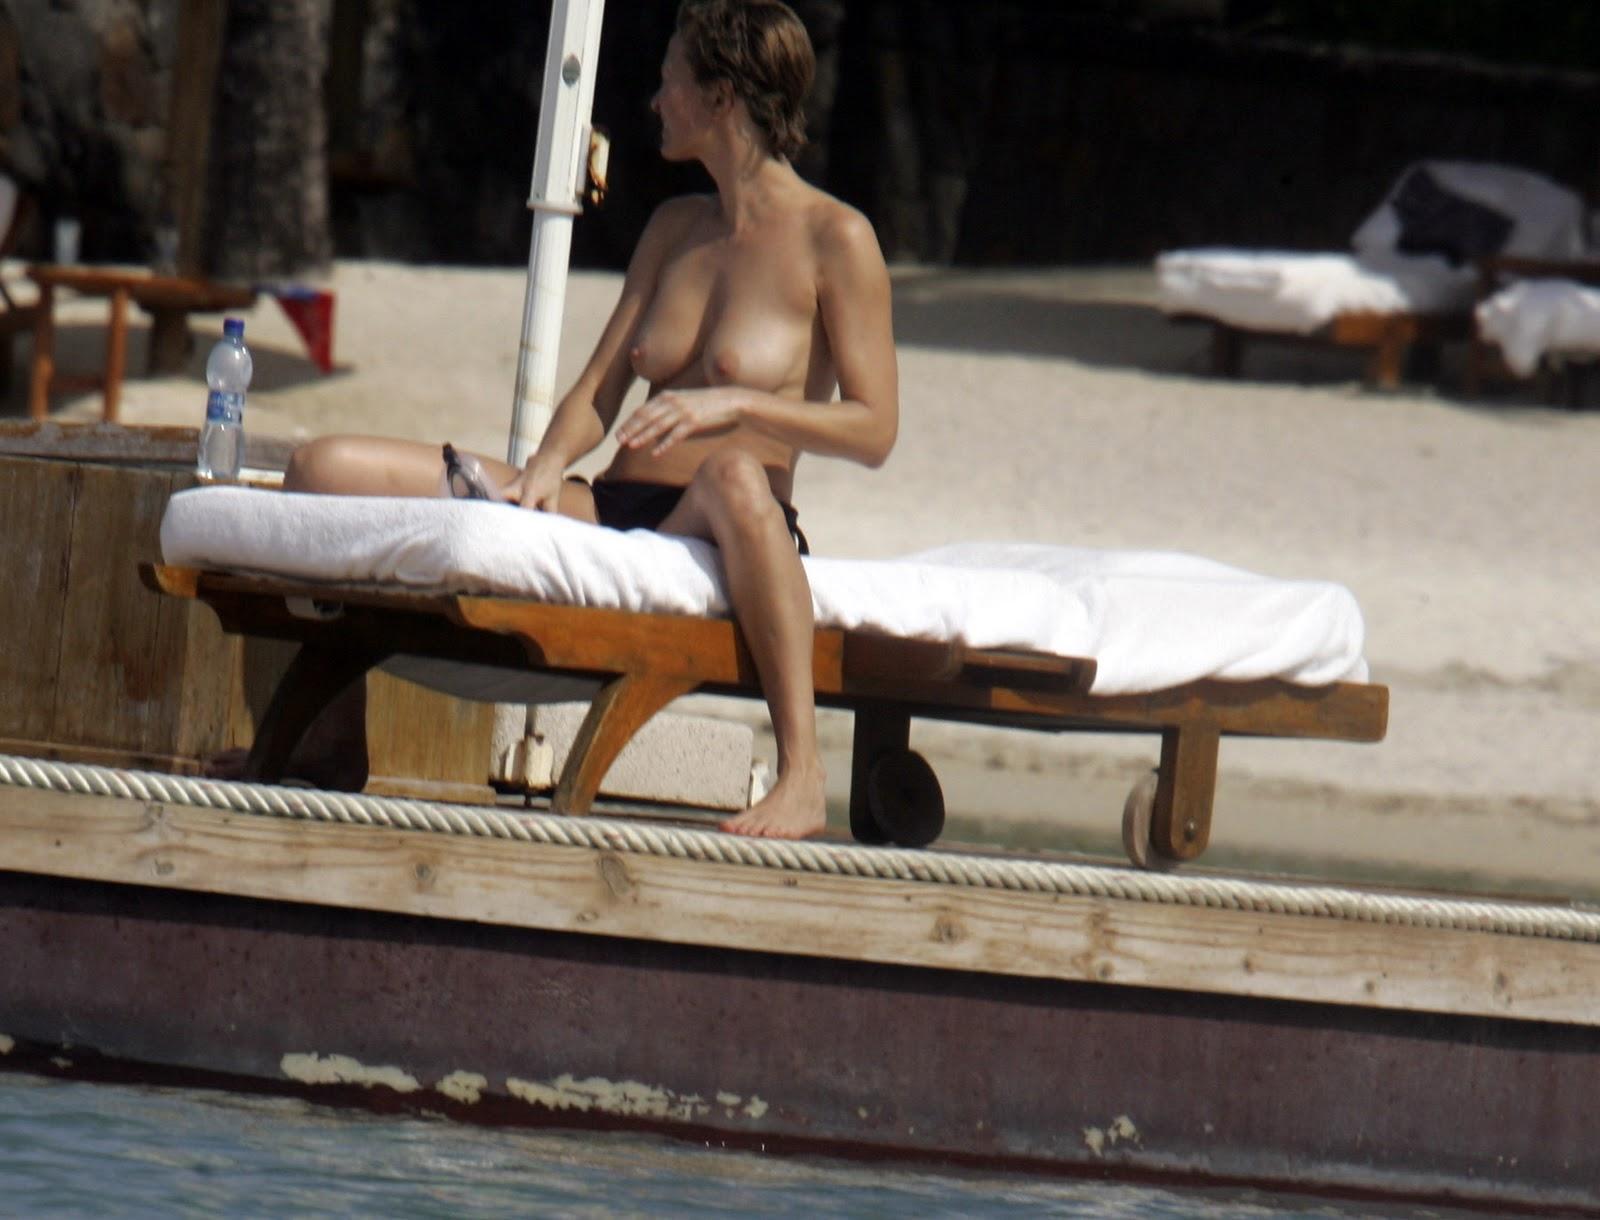 mauritius-nude-beach-girl-pic-naked-women-sexting